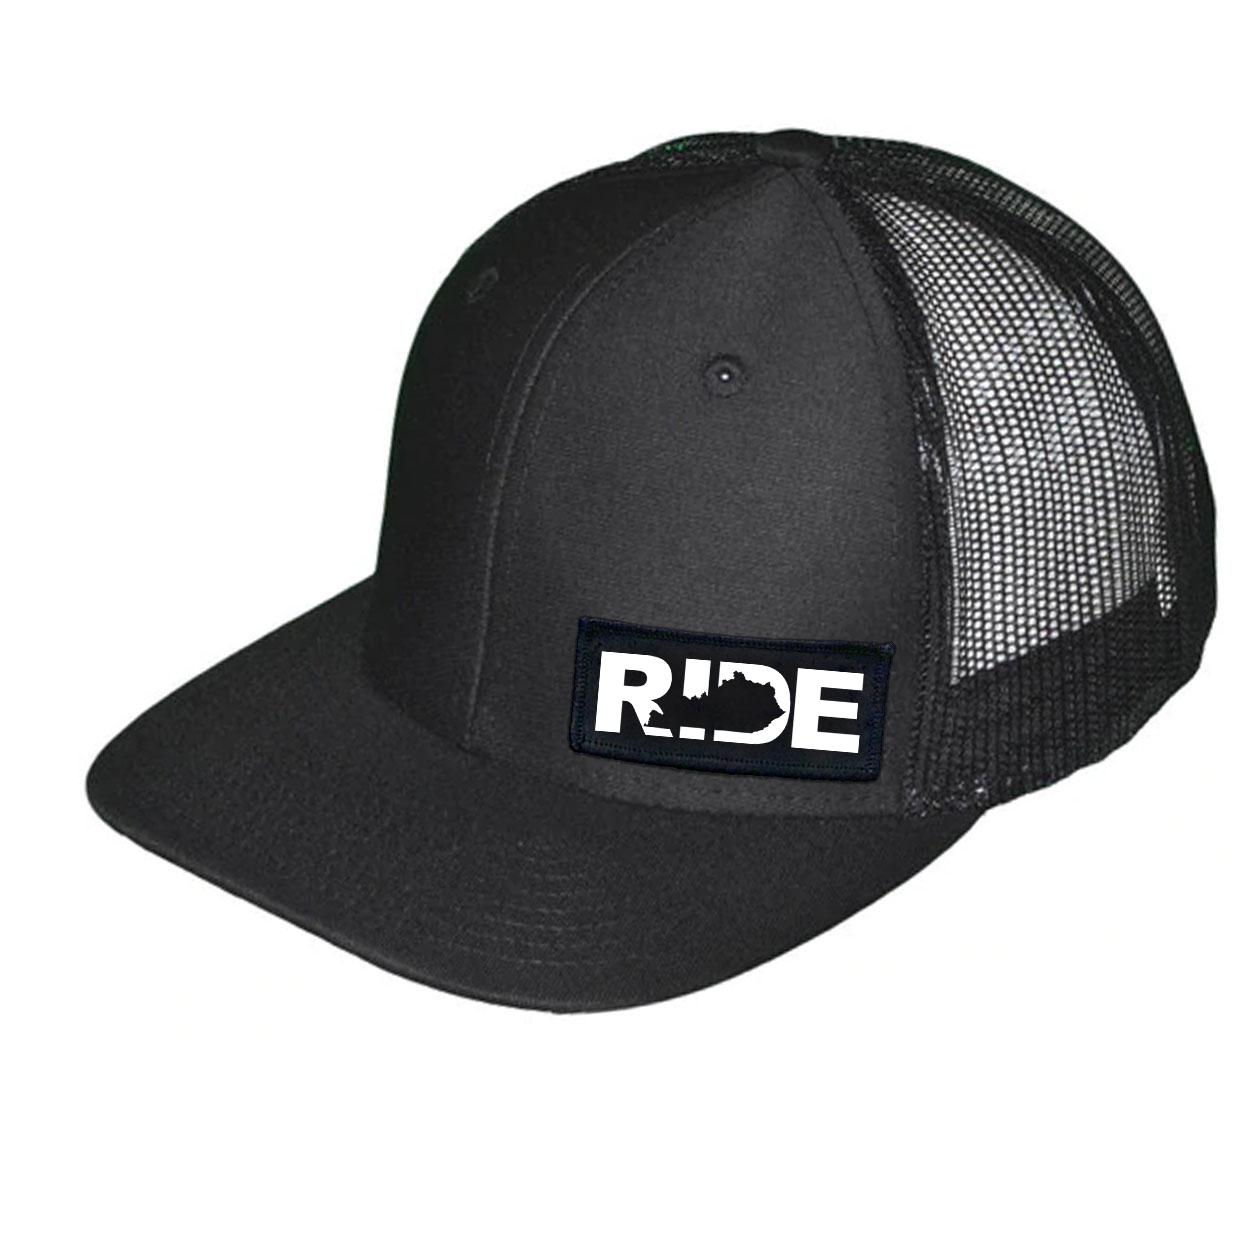 Ride Kentucky Night Out Woven Patch Snapback Trucker Hat Black (White Logo)